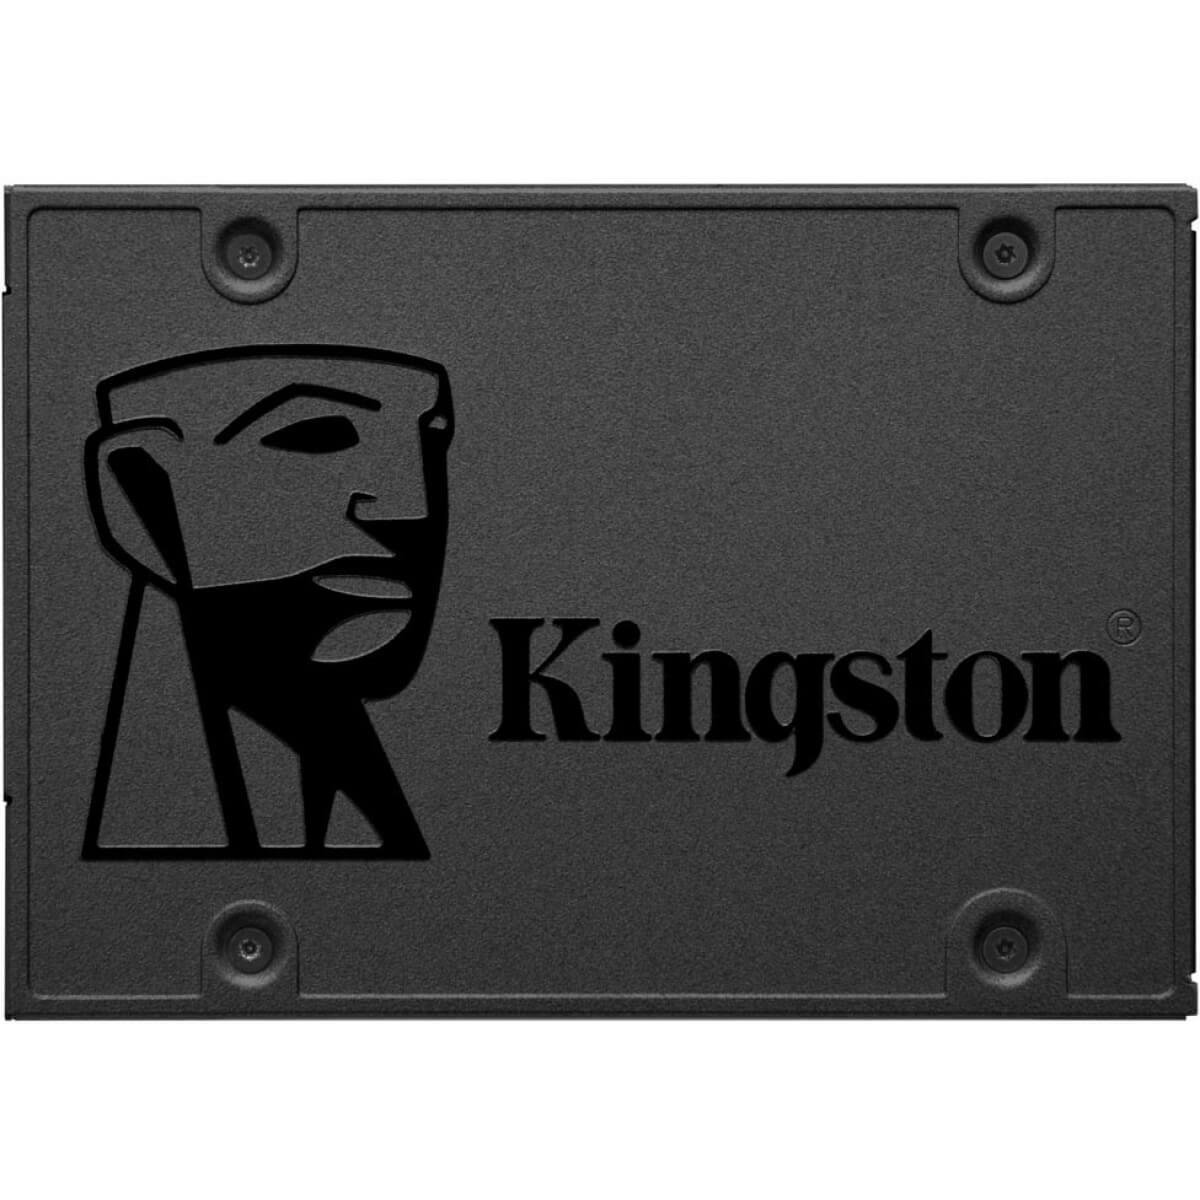 "HD SSD KINGSTON A400 480GB SATA 2.5"" SA400S37"